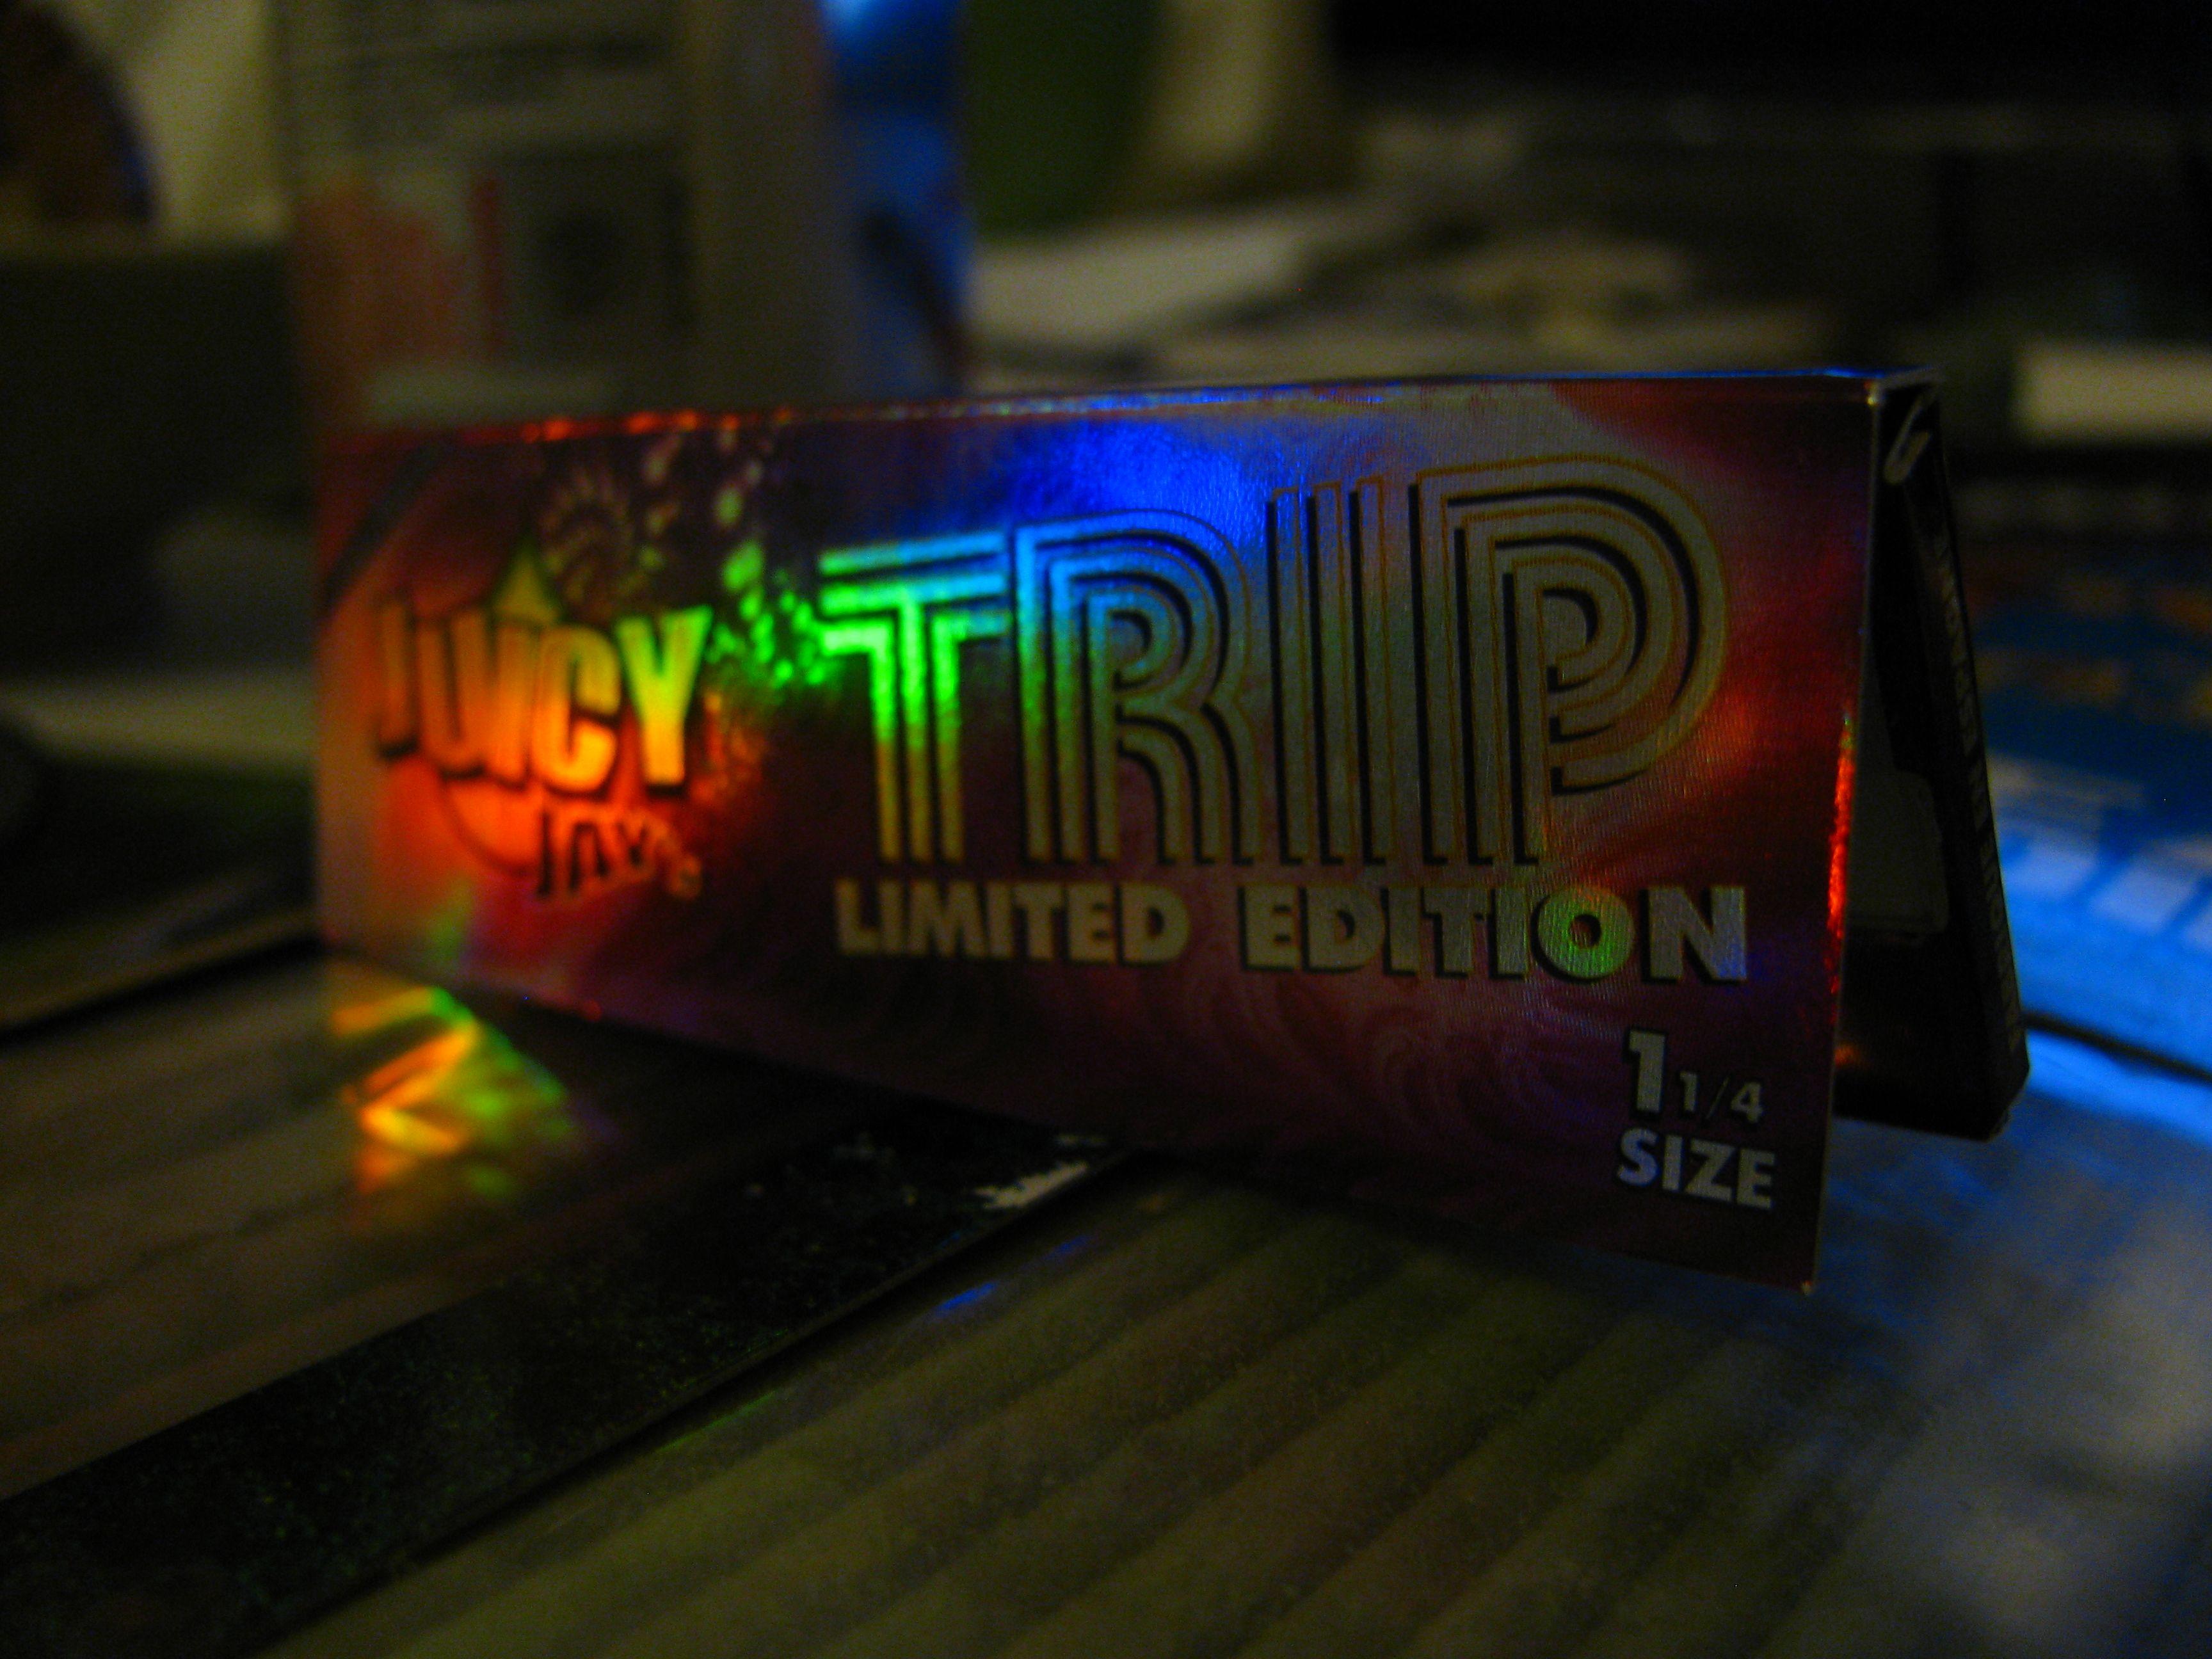 juicy jay's trip limited edition 1 1/4s  #w33daddict #RollingPaper #Blunts #Smoking #Rizla+ #OCB #Juicy